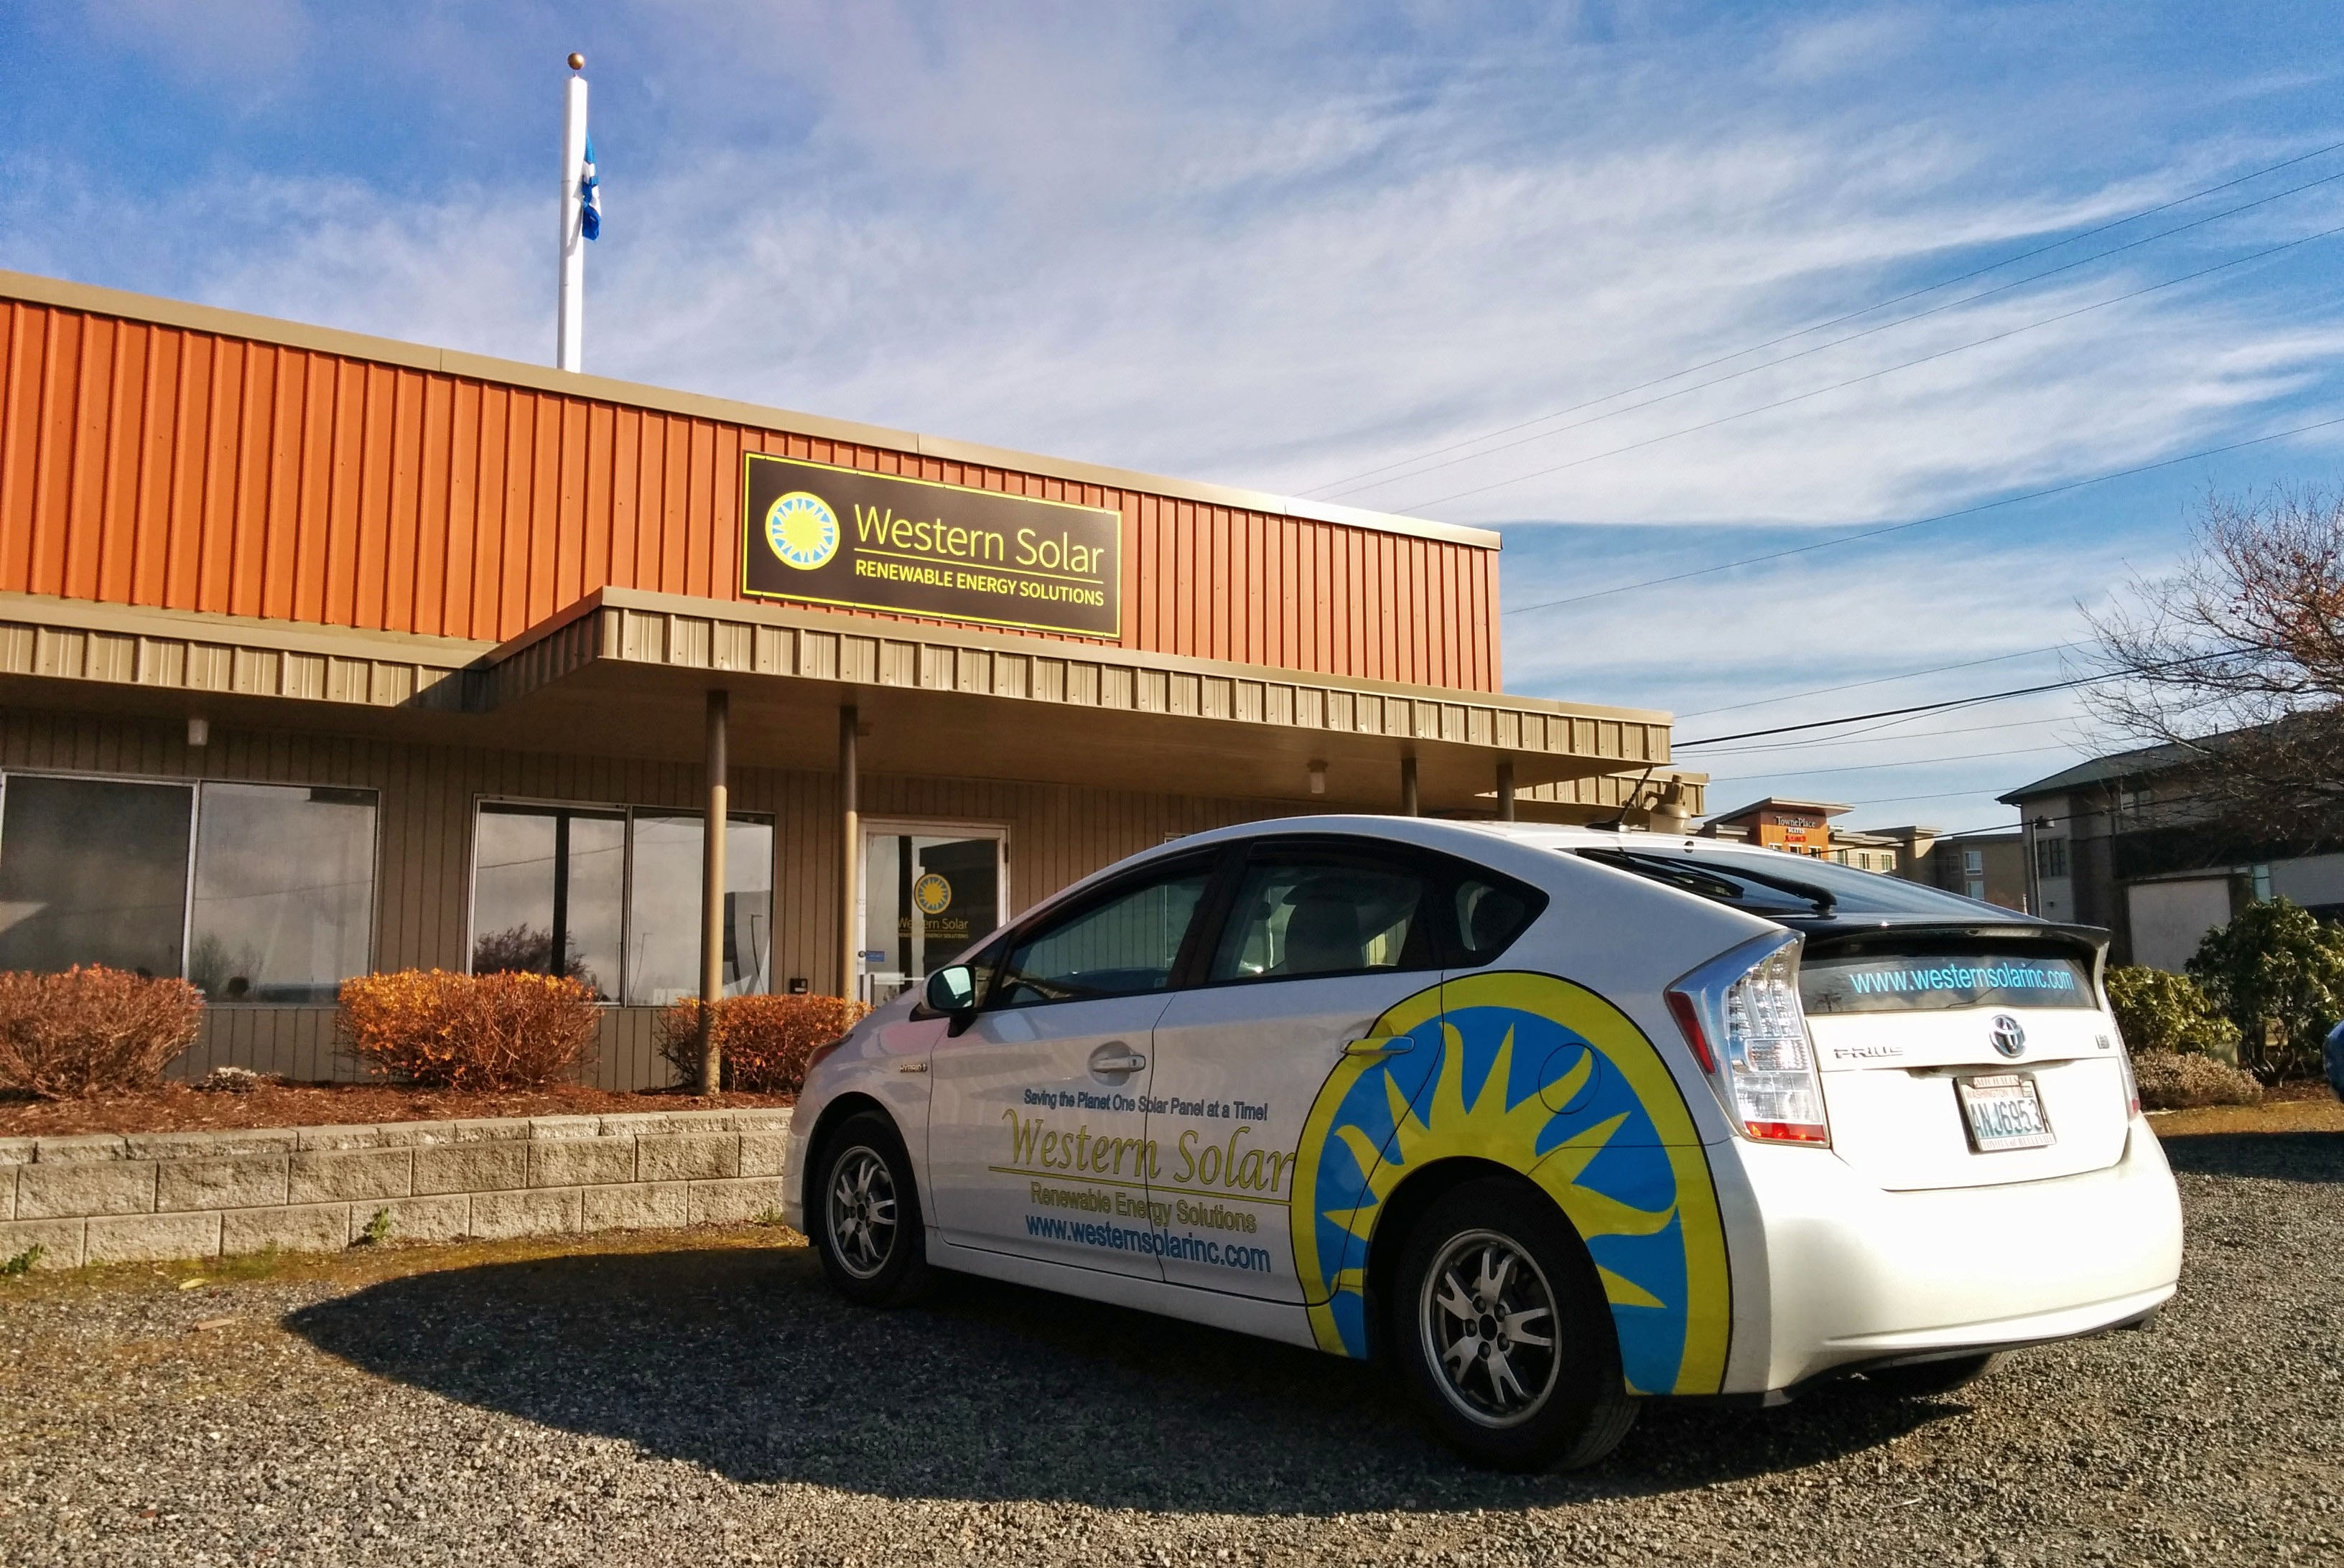 ... Wilson Toyota Bellingham Wa, Image Source: Northwesthonda.com. About  Western Solar Western Solar